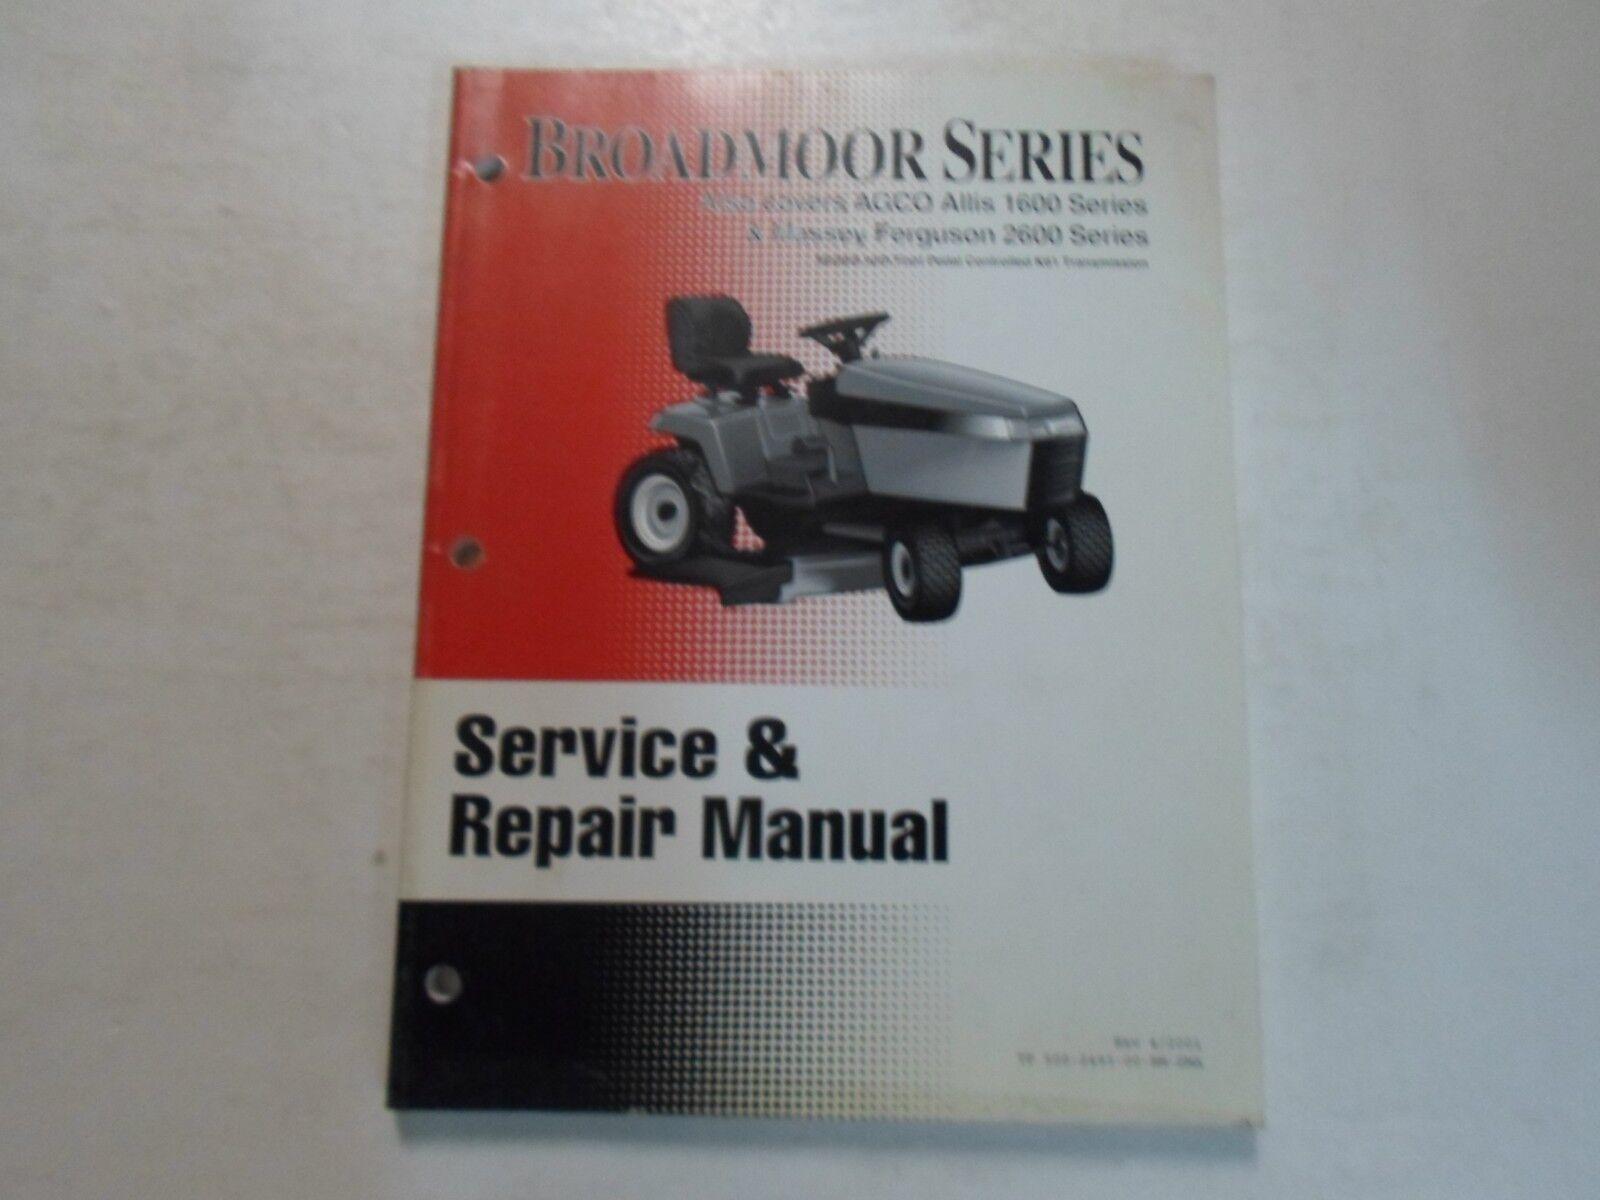 2002 Semplicità Allis 1600 Massey Ferguson 2600 Libro Broadmoor Serie